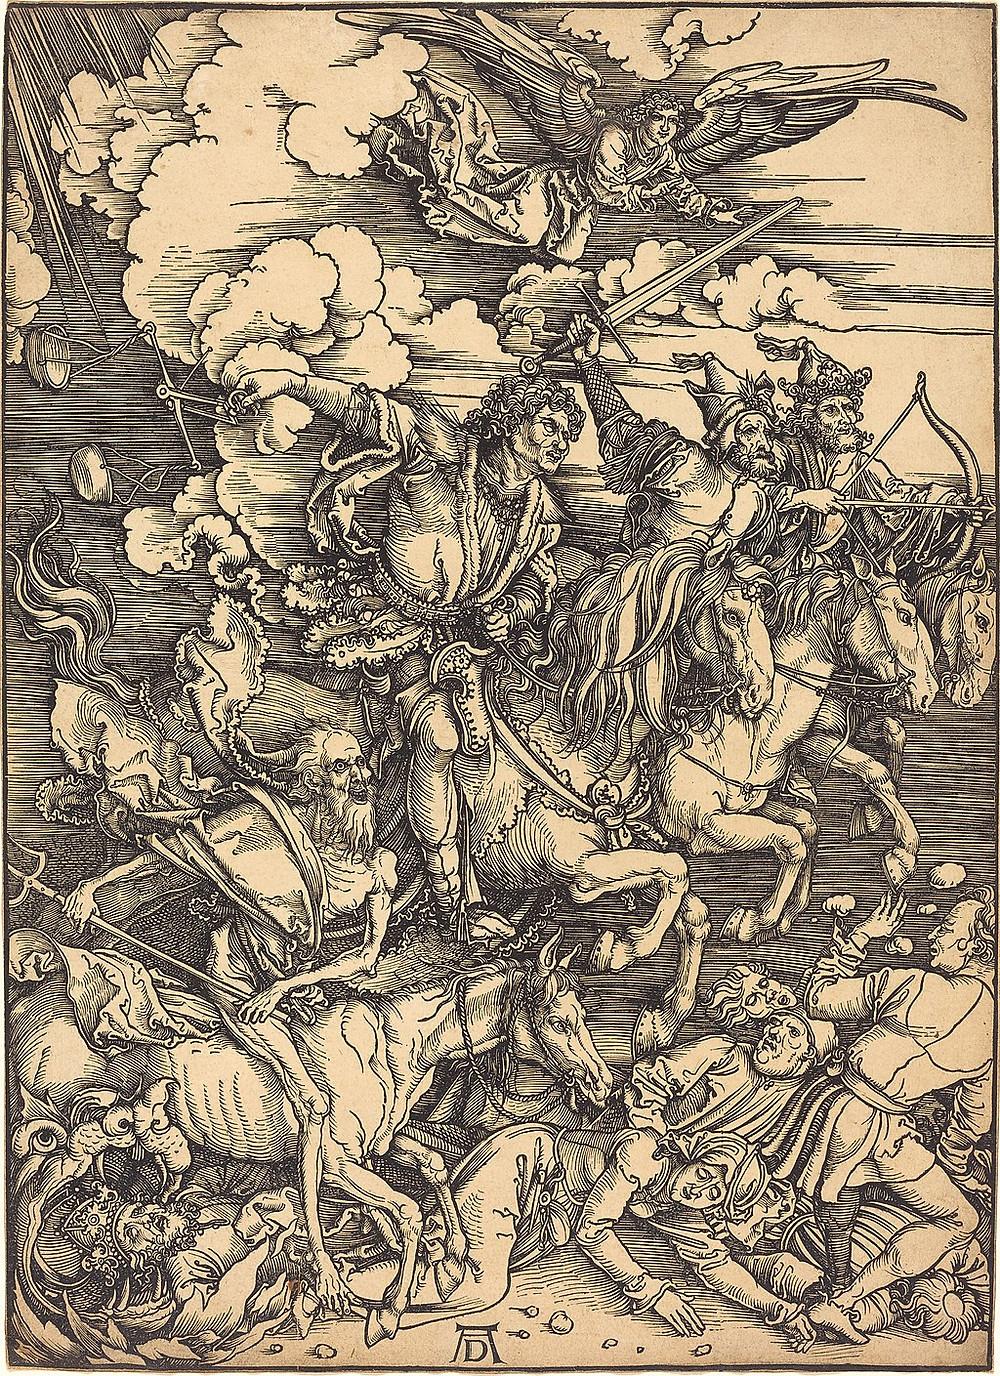 Albrecht Dürer (15.yy)